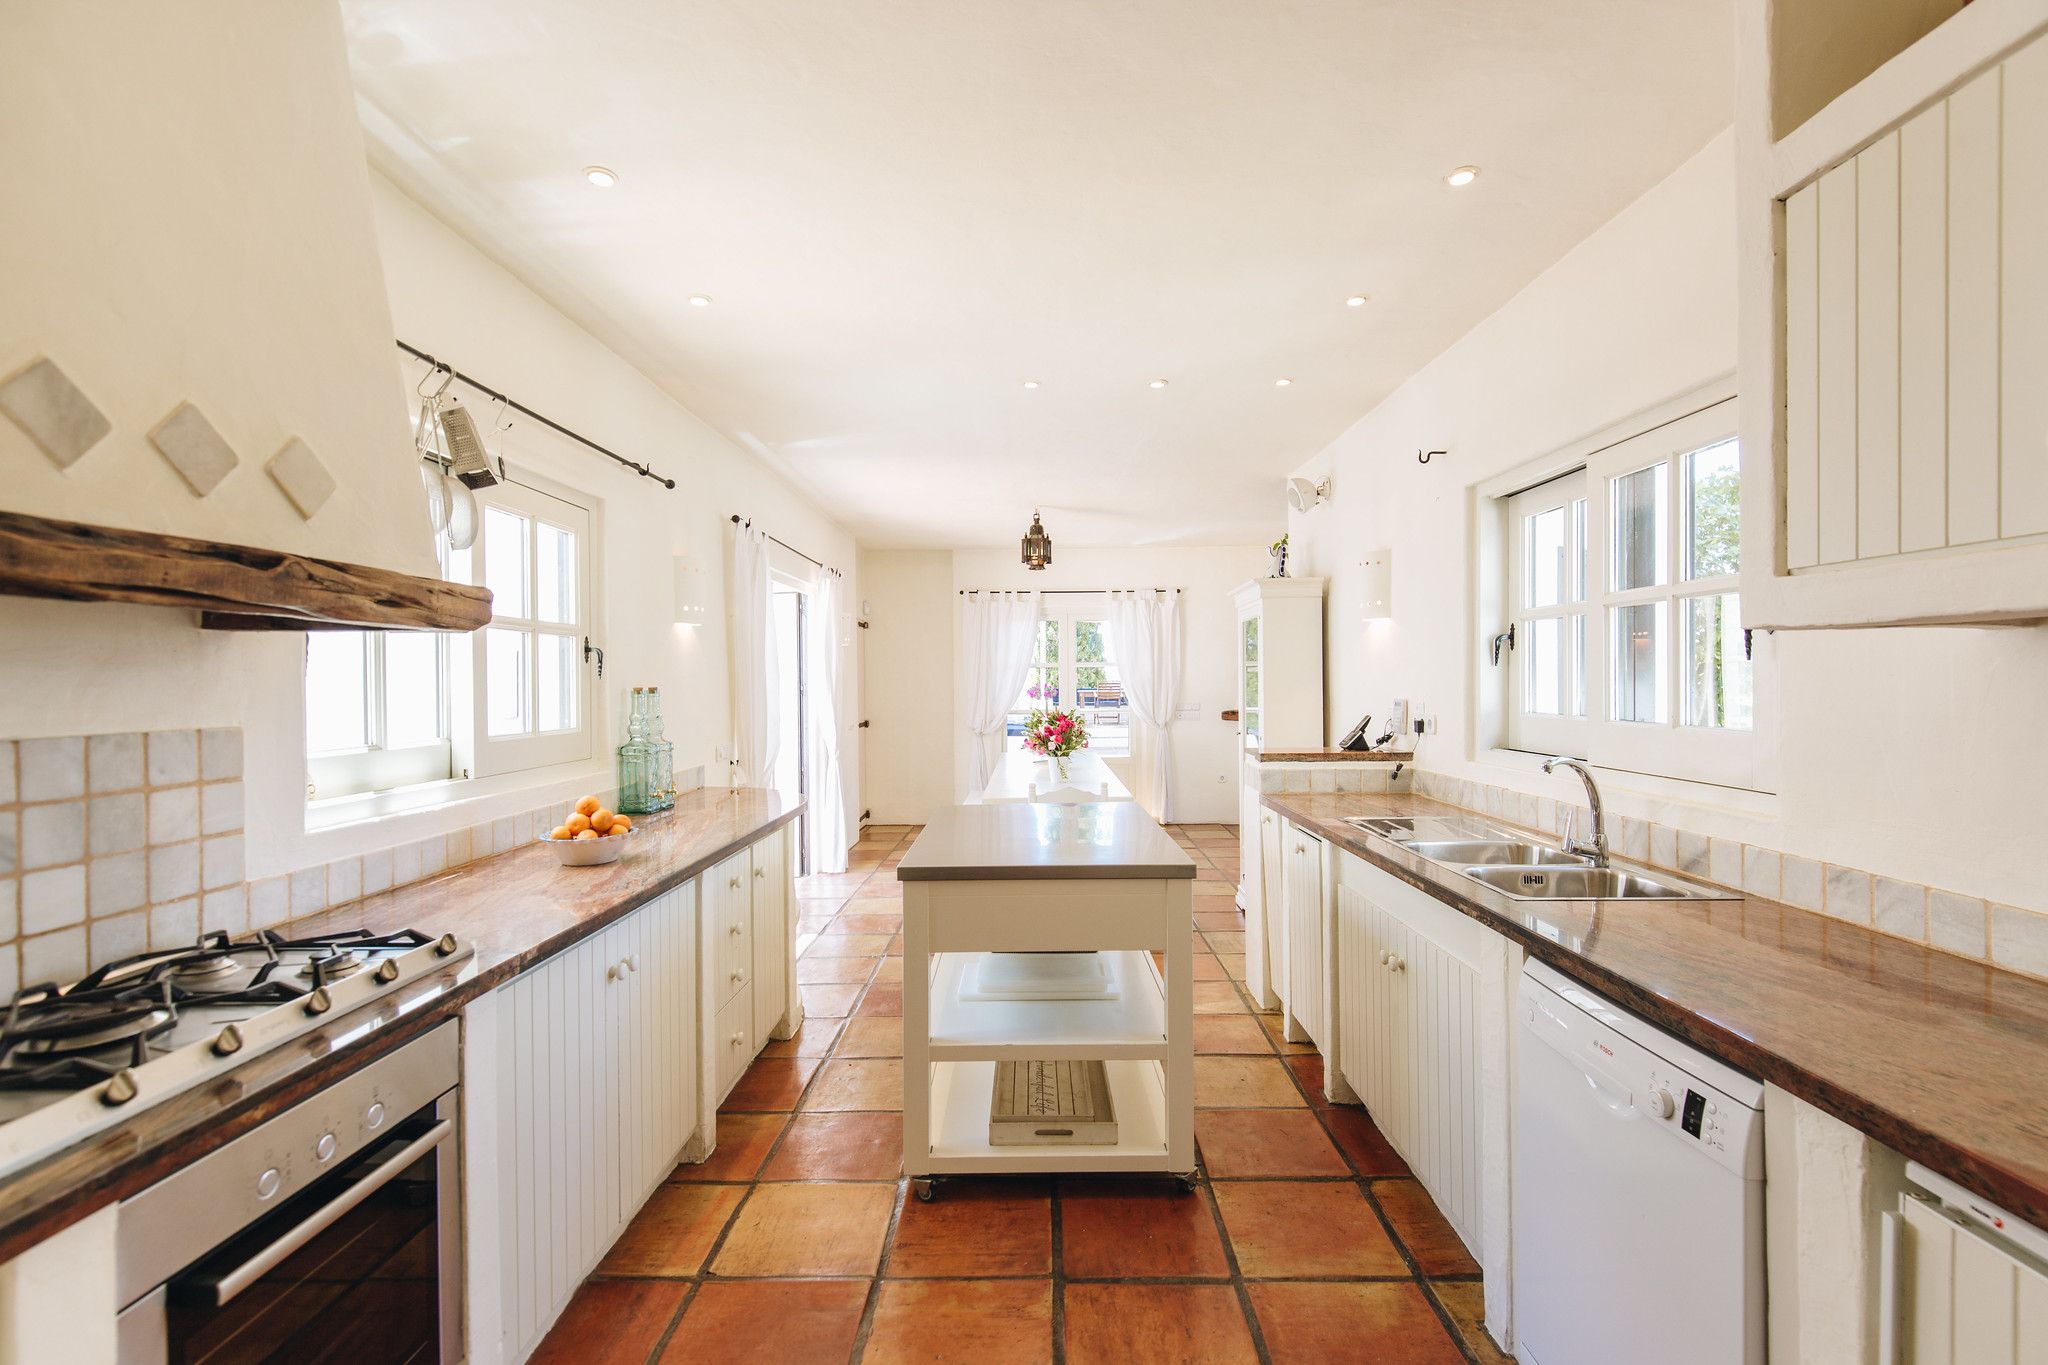 https://www.white-ibiza.com/wp-content/uploads/2020/05/white-ibiza-villas-can-amelida-interior-kitchen.jpg